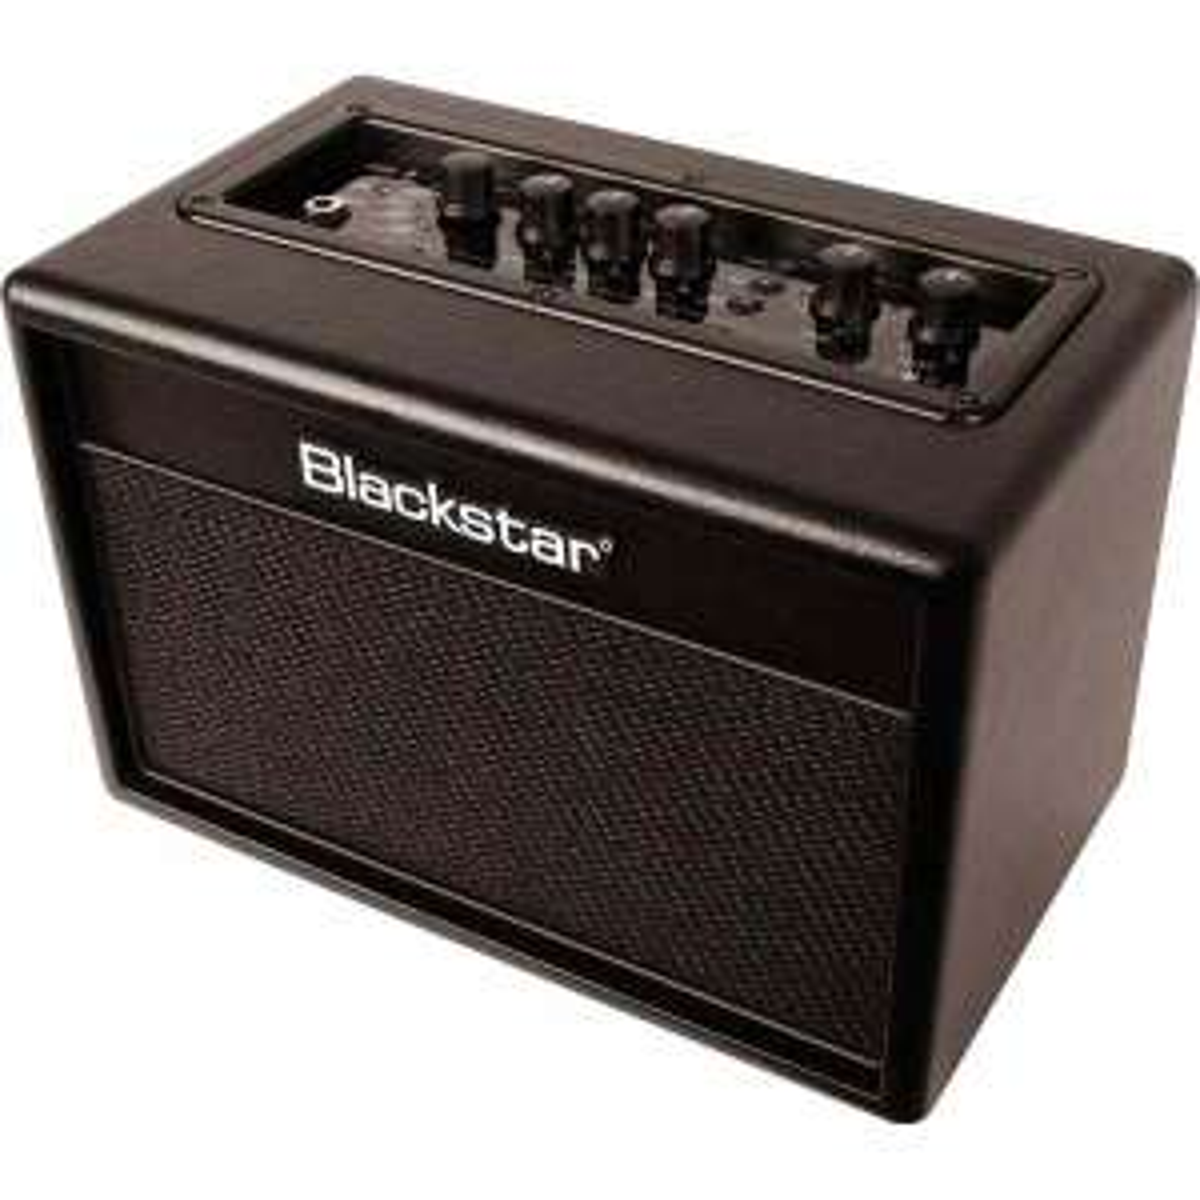 Blackstar ID Core BEAM mini guitar amplifier and bluetooth speaker £152.10 @ Dawsons Music